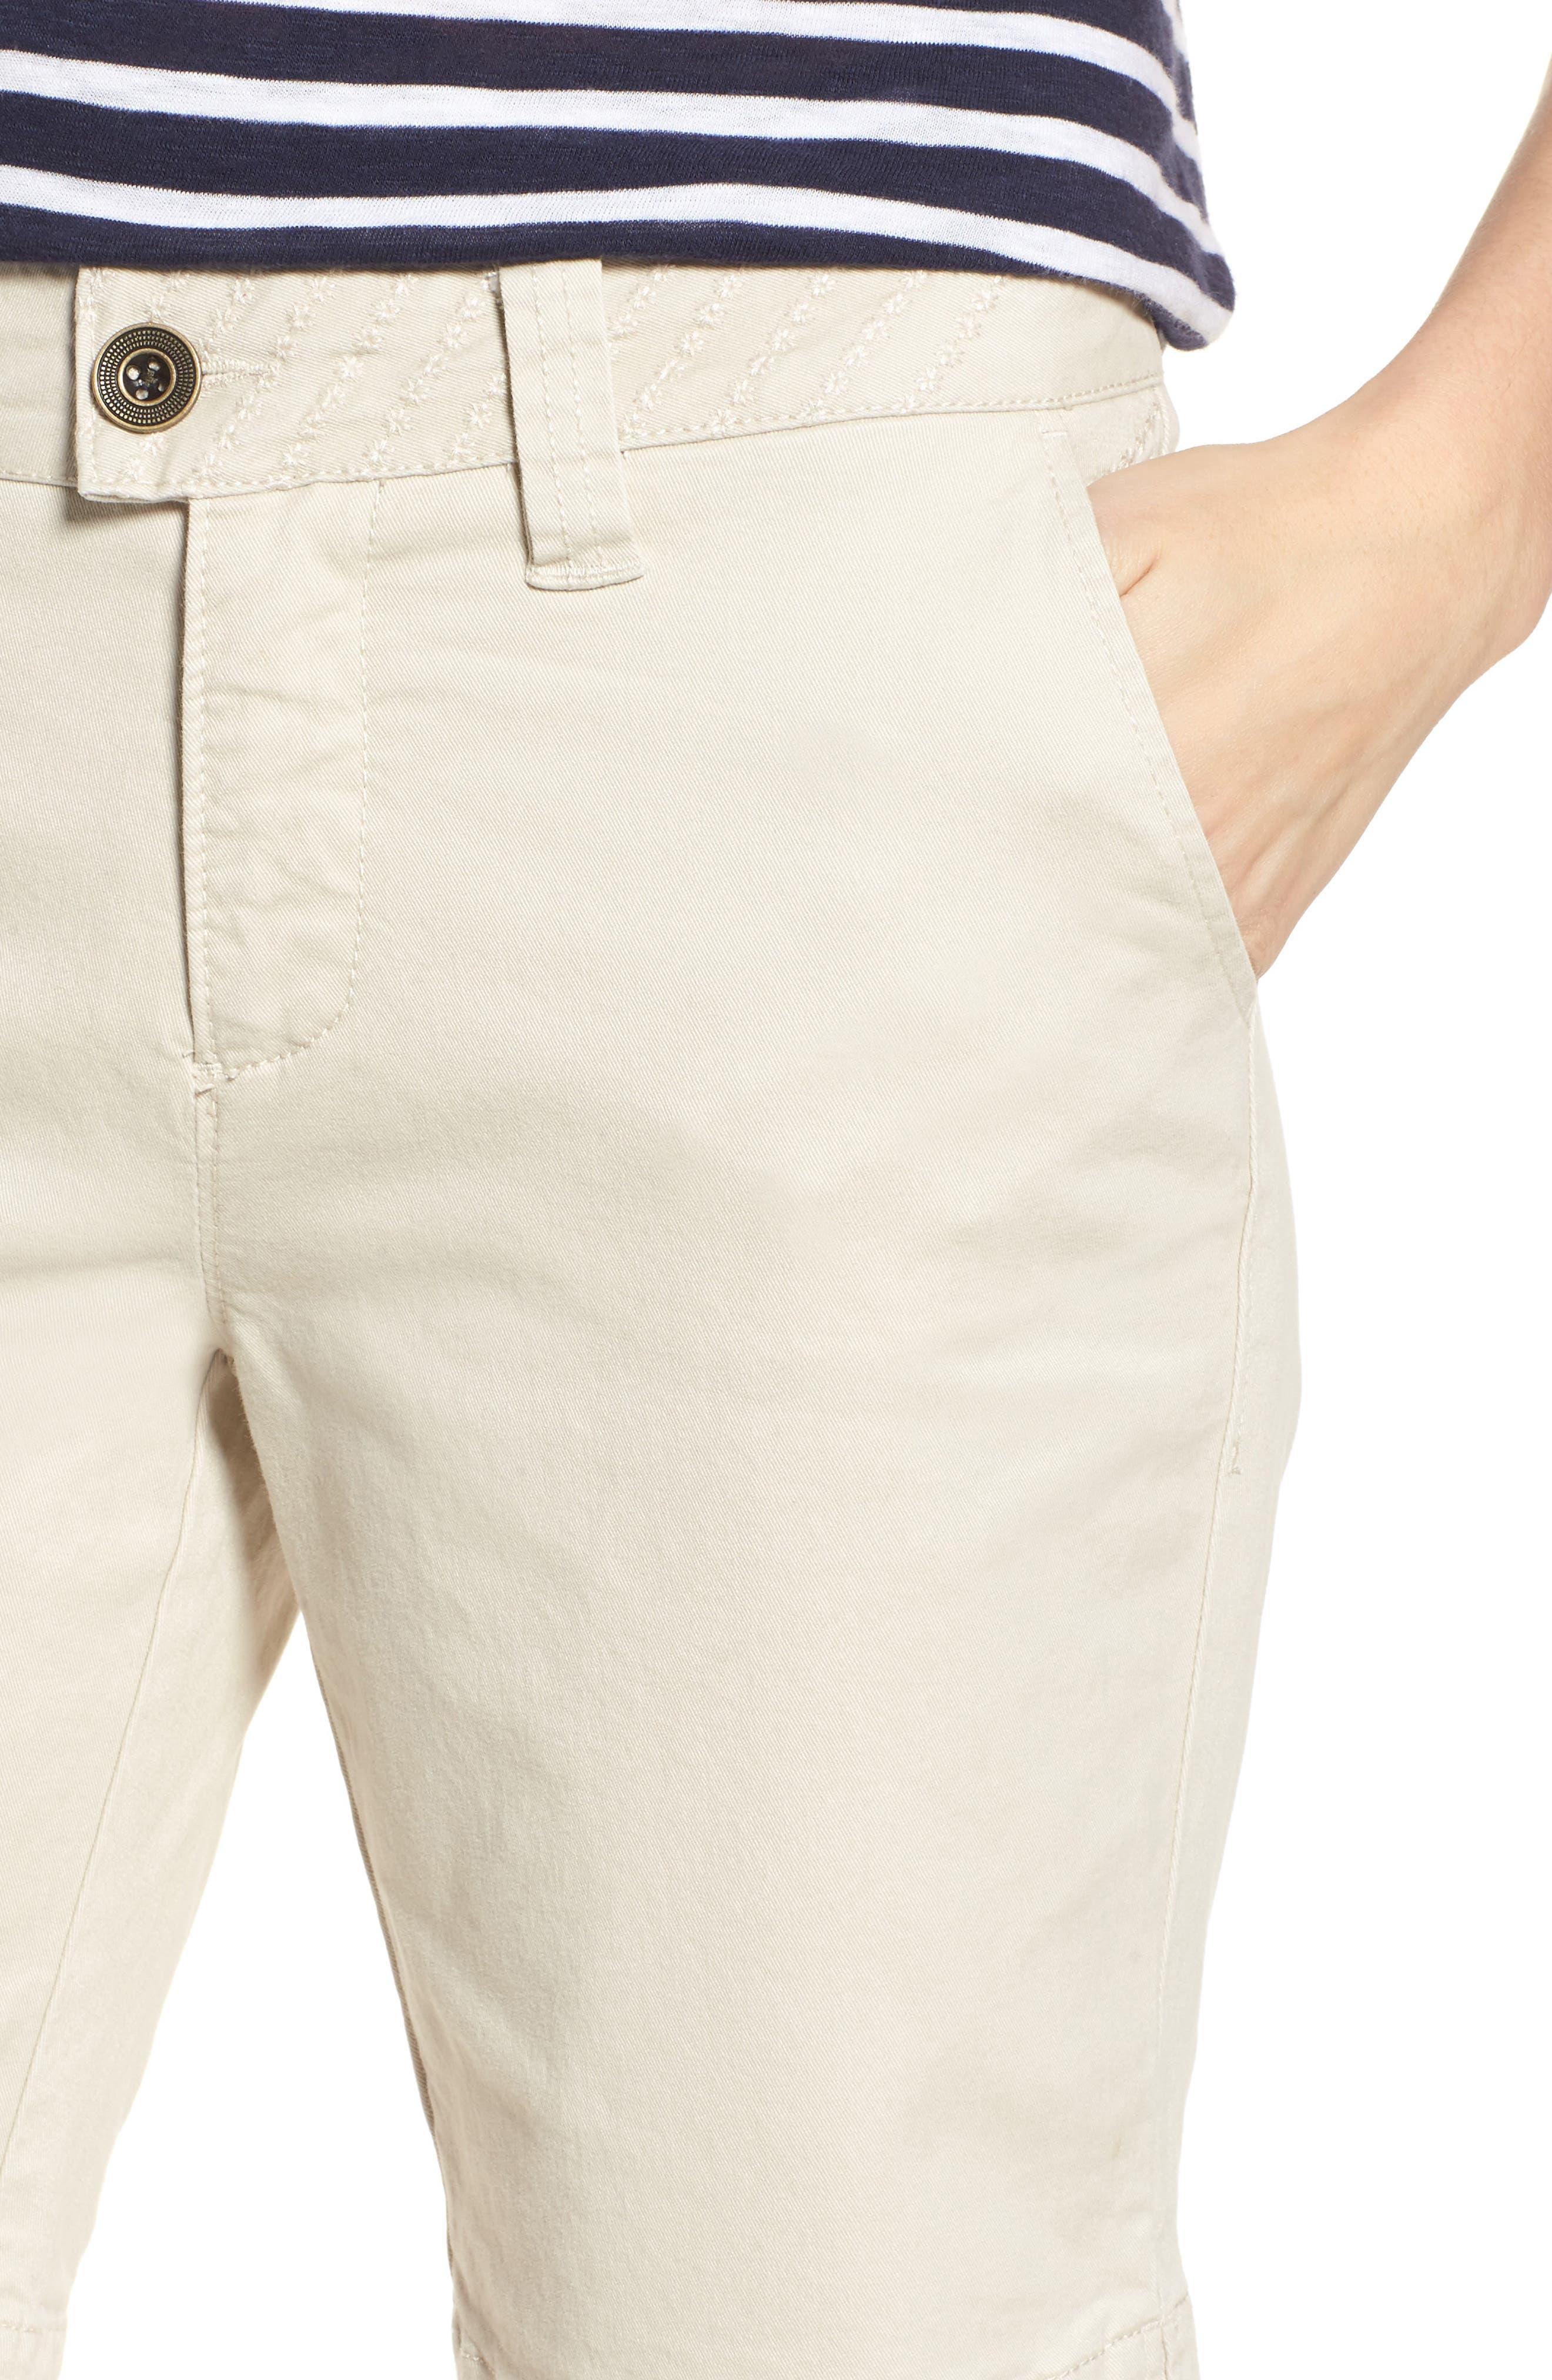 Creston Twill Shorts,                             Alternate thumbnail 4, color,                             Stone